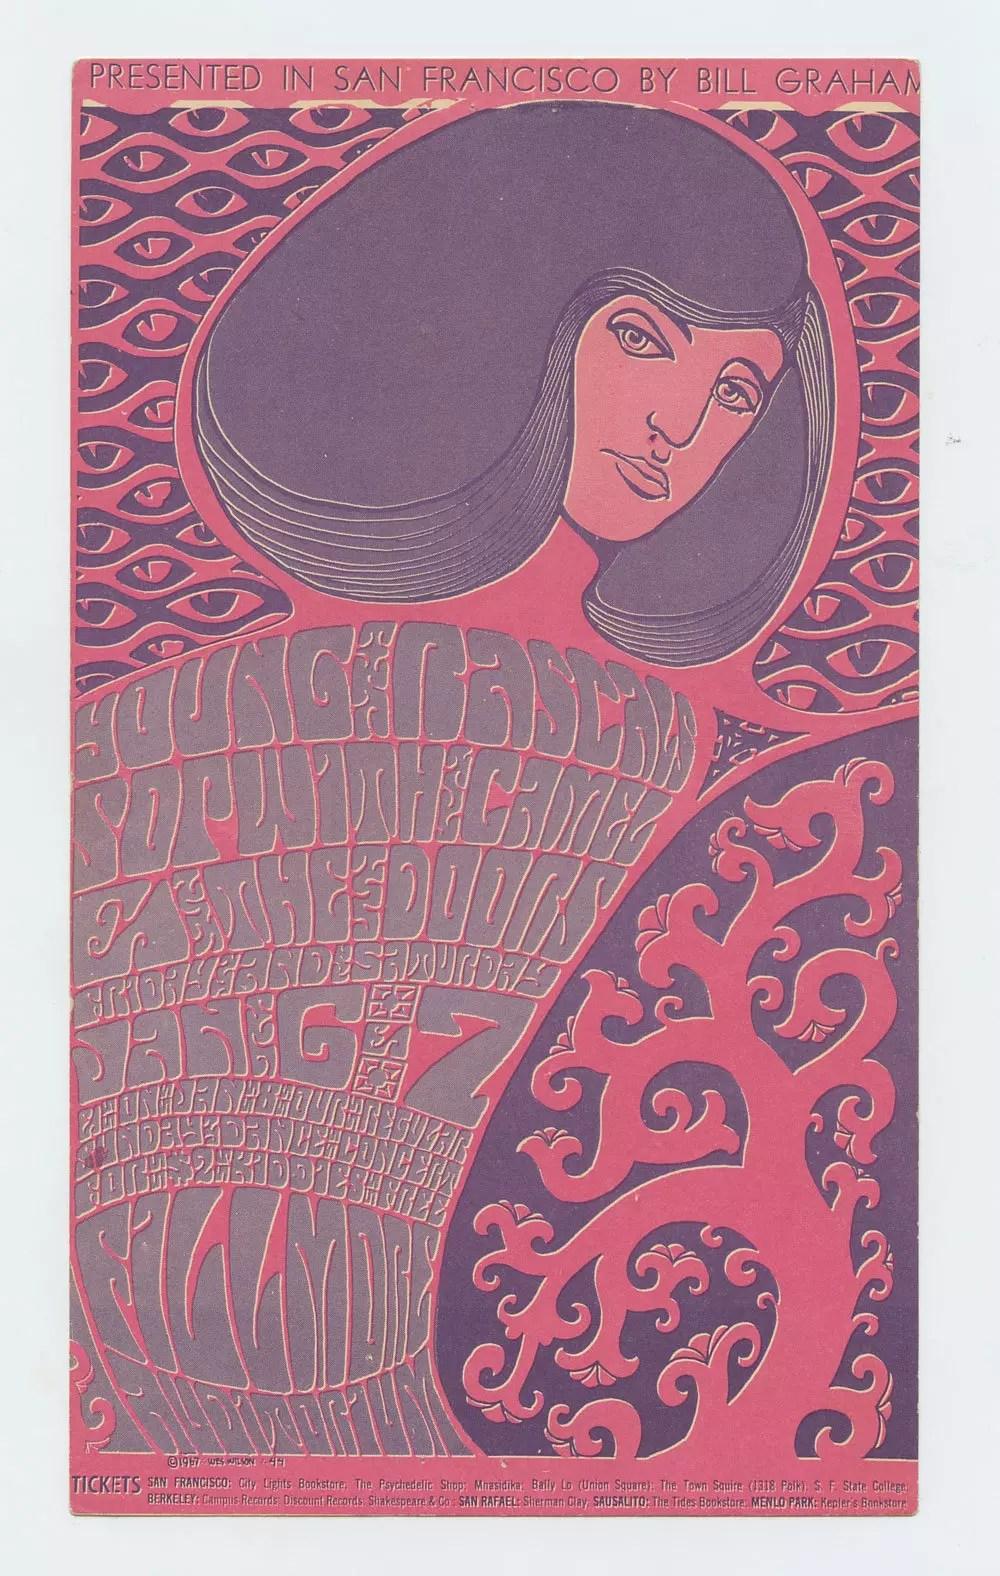 Bill Graham 044 Handbill The Doors Young Rascals Sopwith Camel 1967 Jan 6